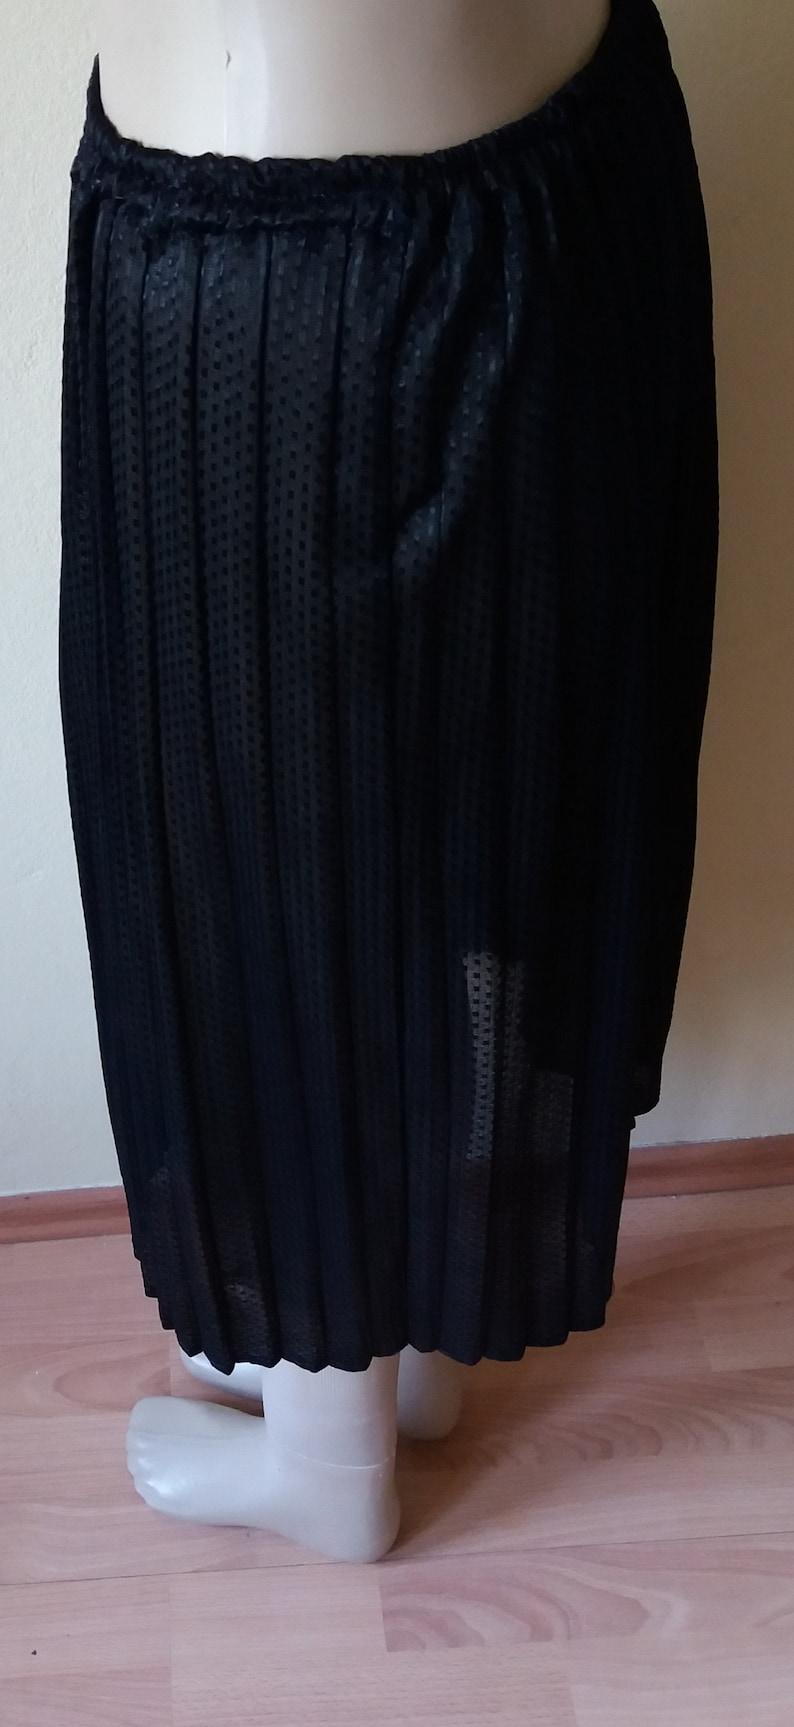 Vintage 80s Sewn Pleated Skirt,Black Transparent Shiny Dots Fabric Skirt,Elastic Waist Midi Length Size LXL Skirt